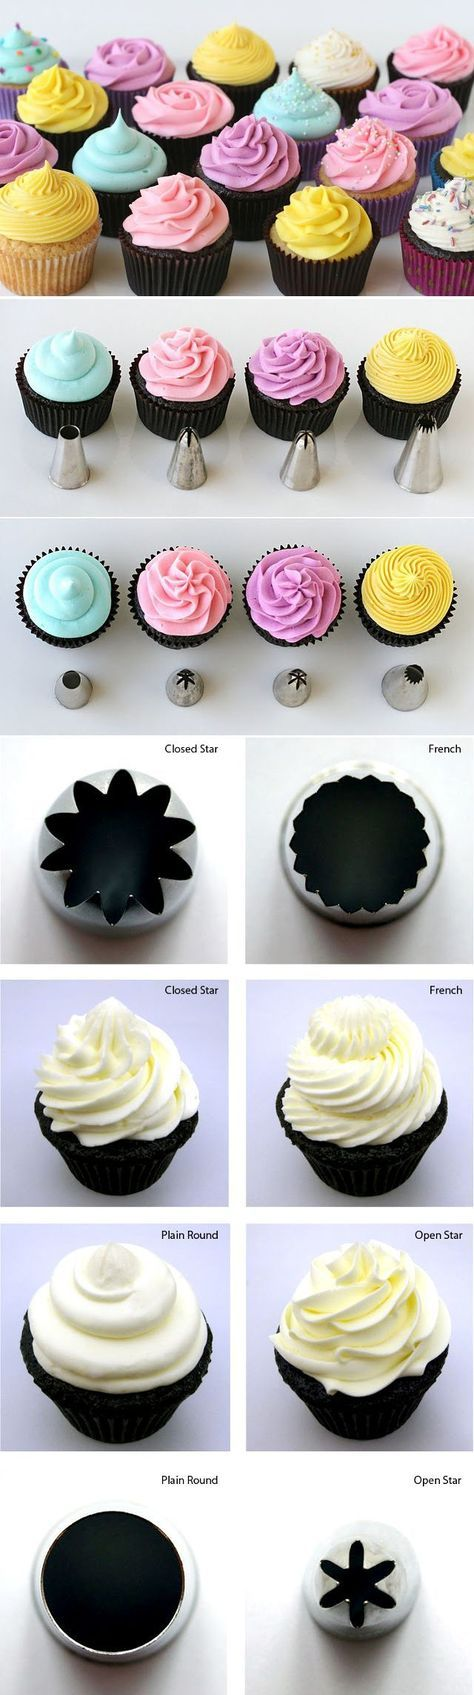 {Cupcake Basics} How to Frost Cupcakes #cupcakesrezepte